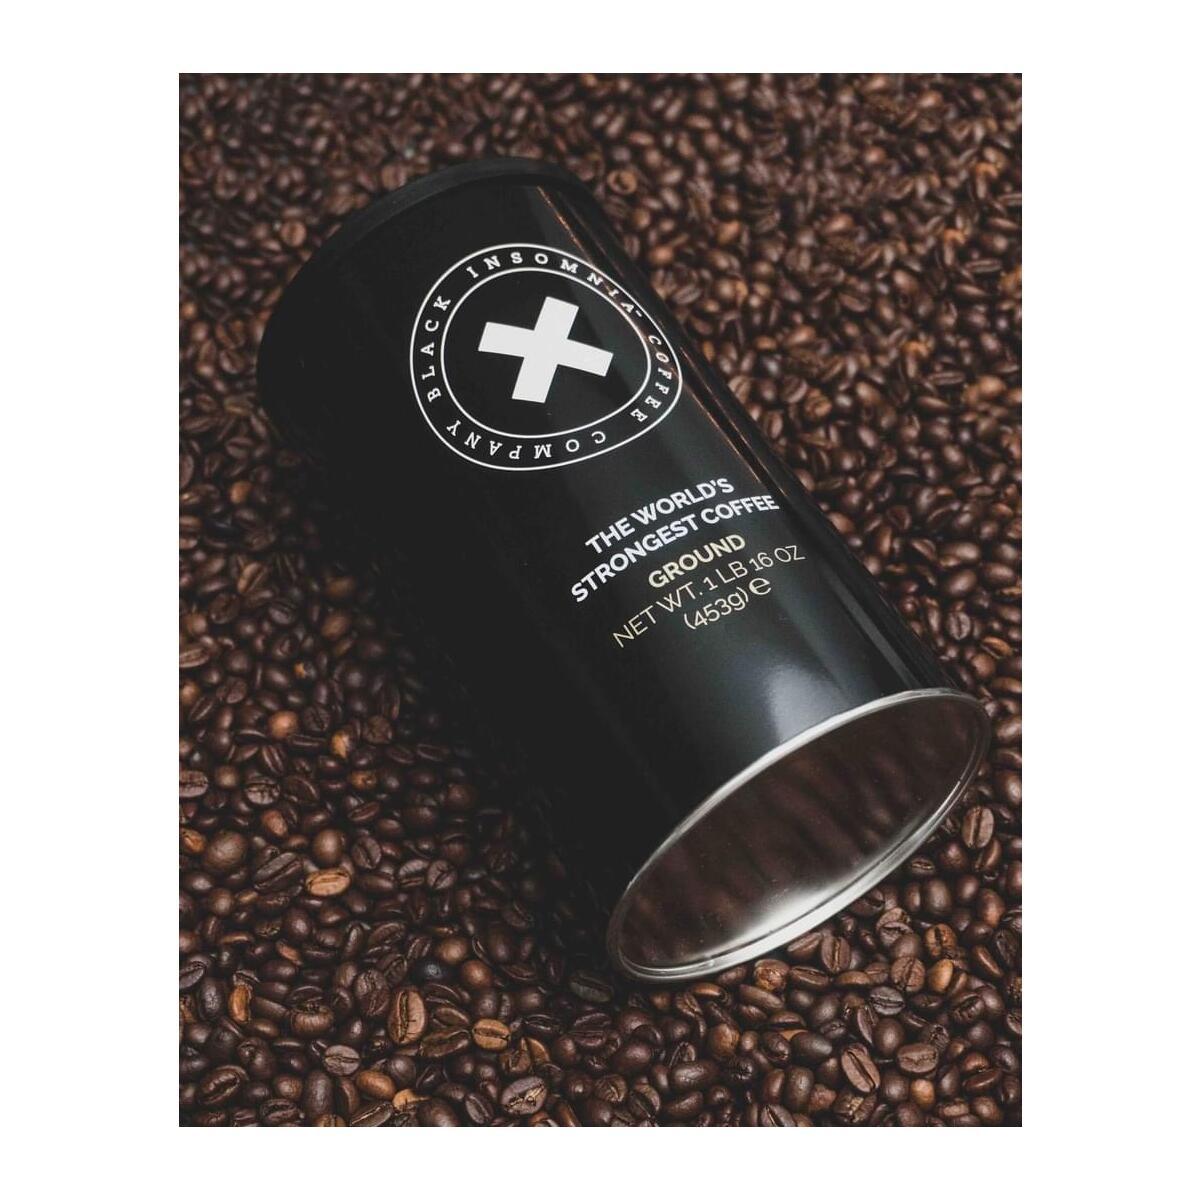 Black Insomnia World's Strongest Coffee - Ground 1lb